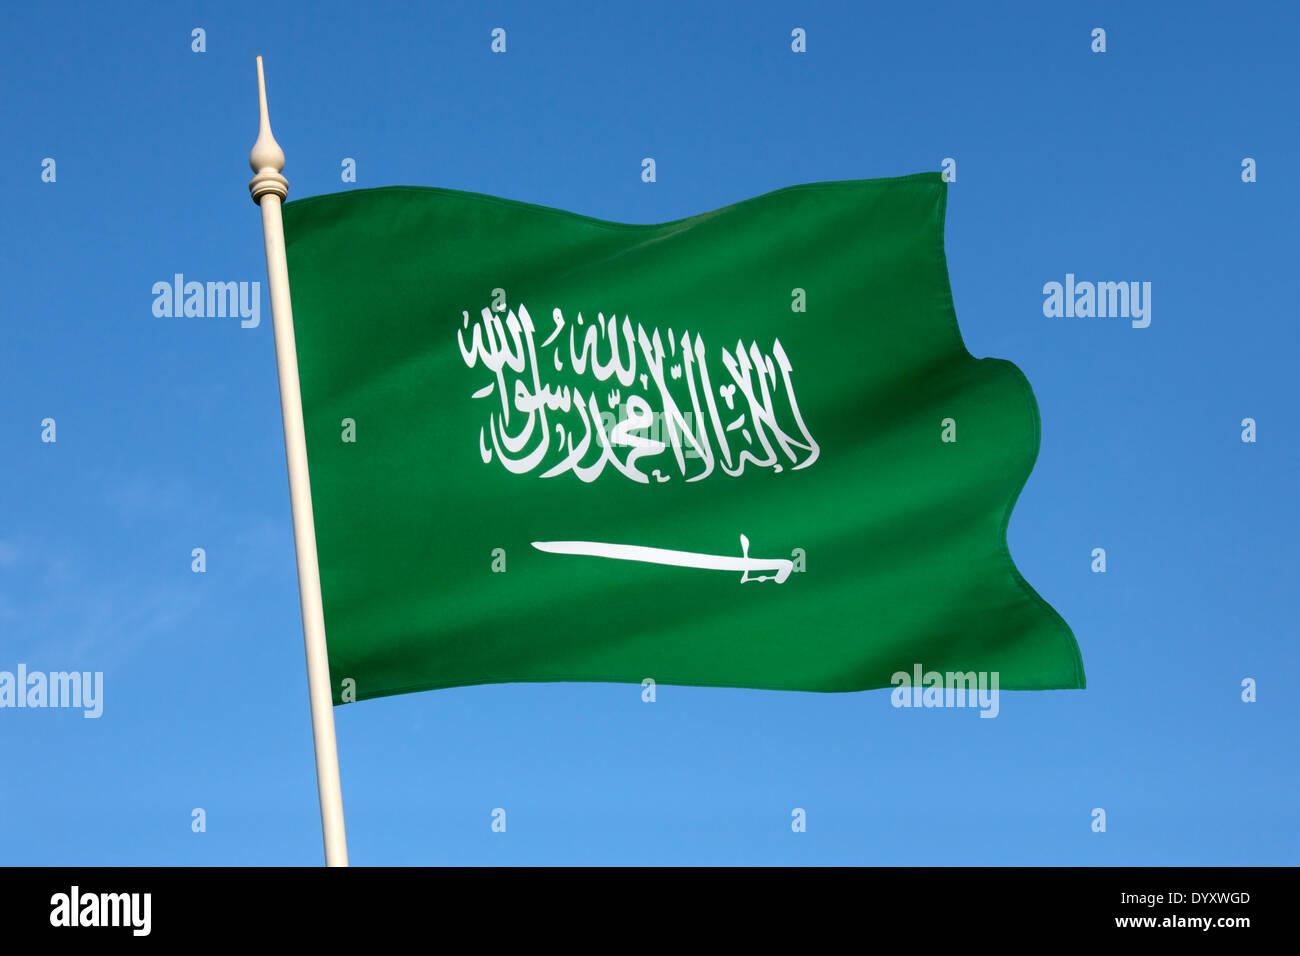 The flag of Saudi Arabia - Stock Image